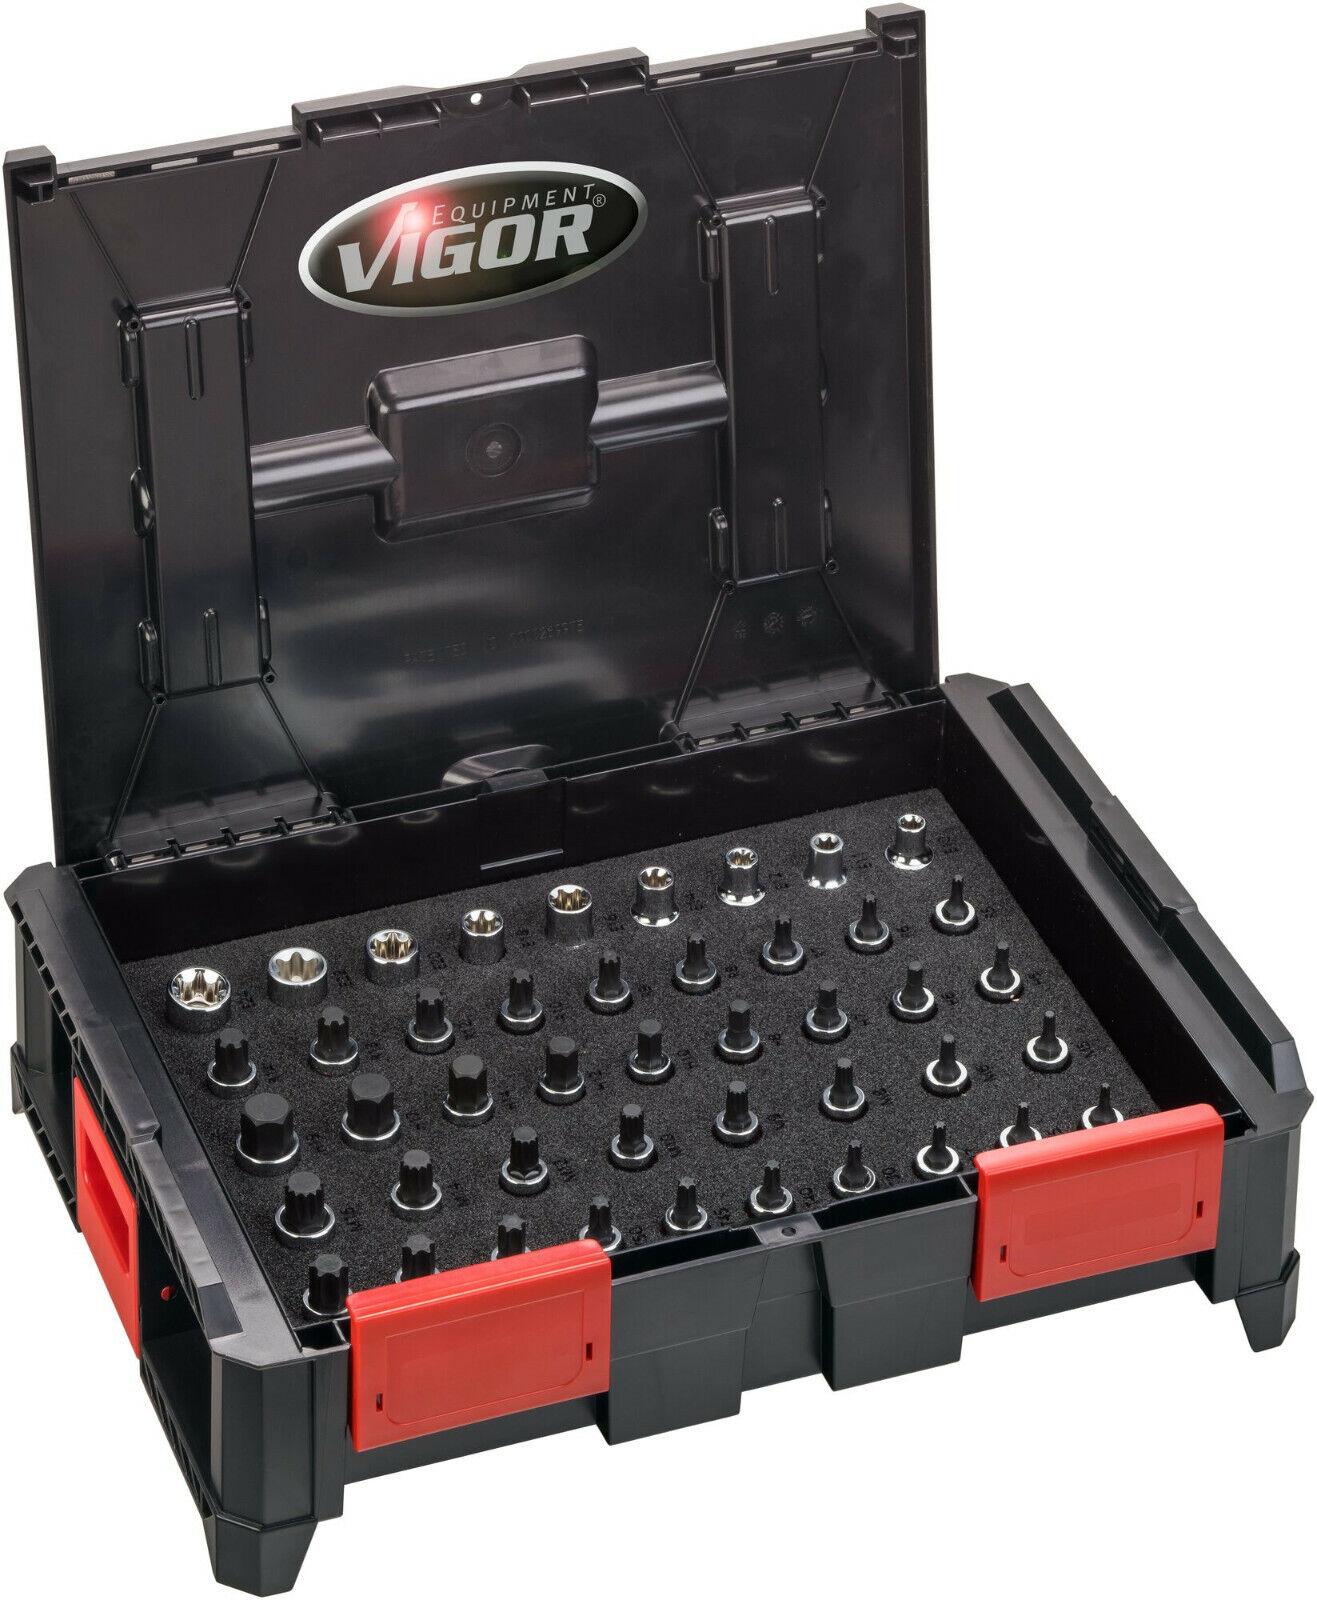 VIGOR V5166 Multibox mit Sortiment Werkzeugboxen-System V5089 Steckschlüssel